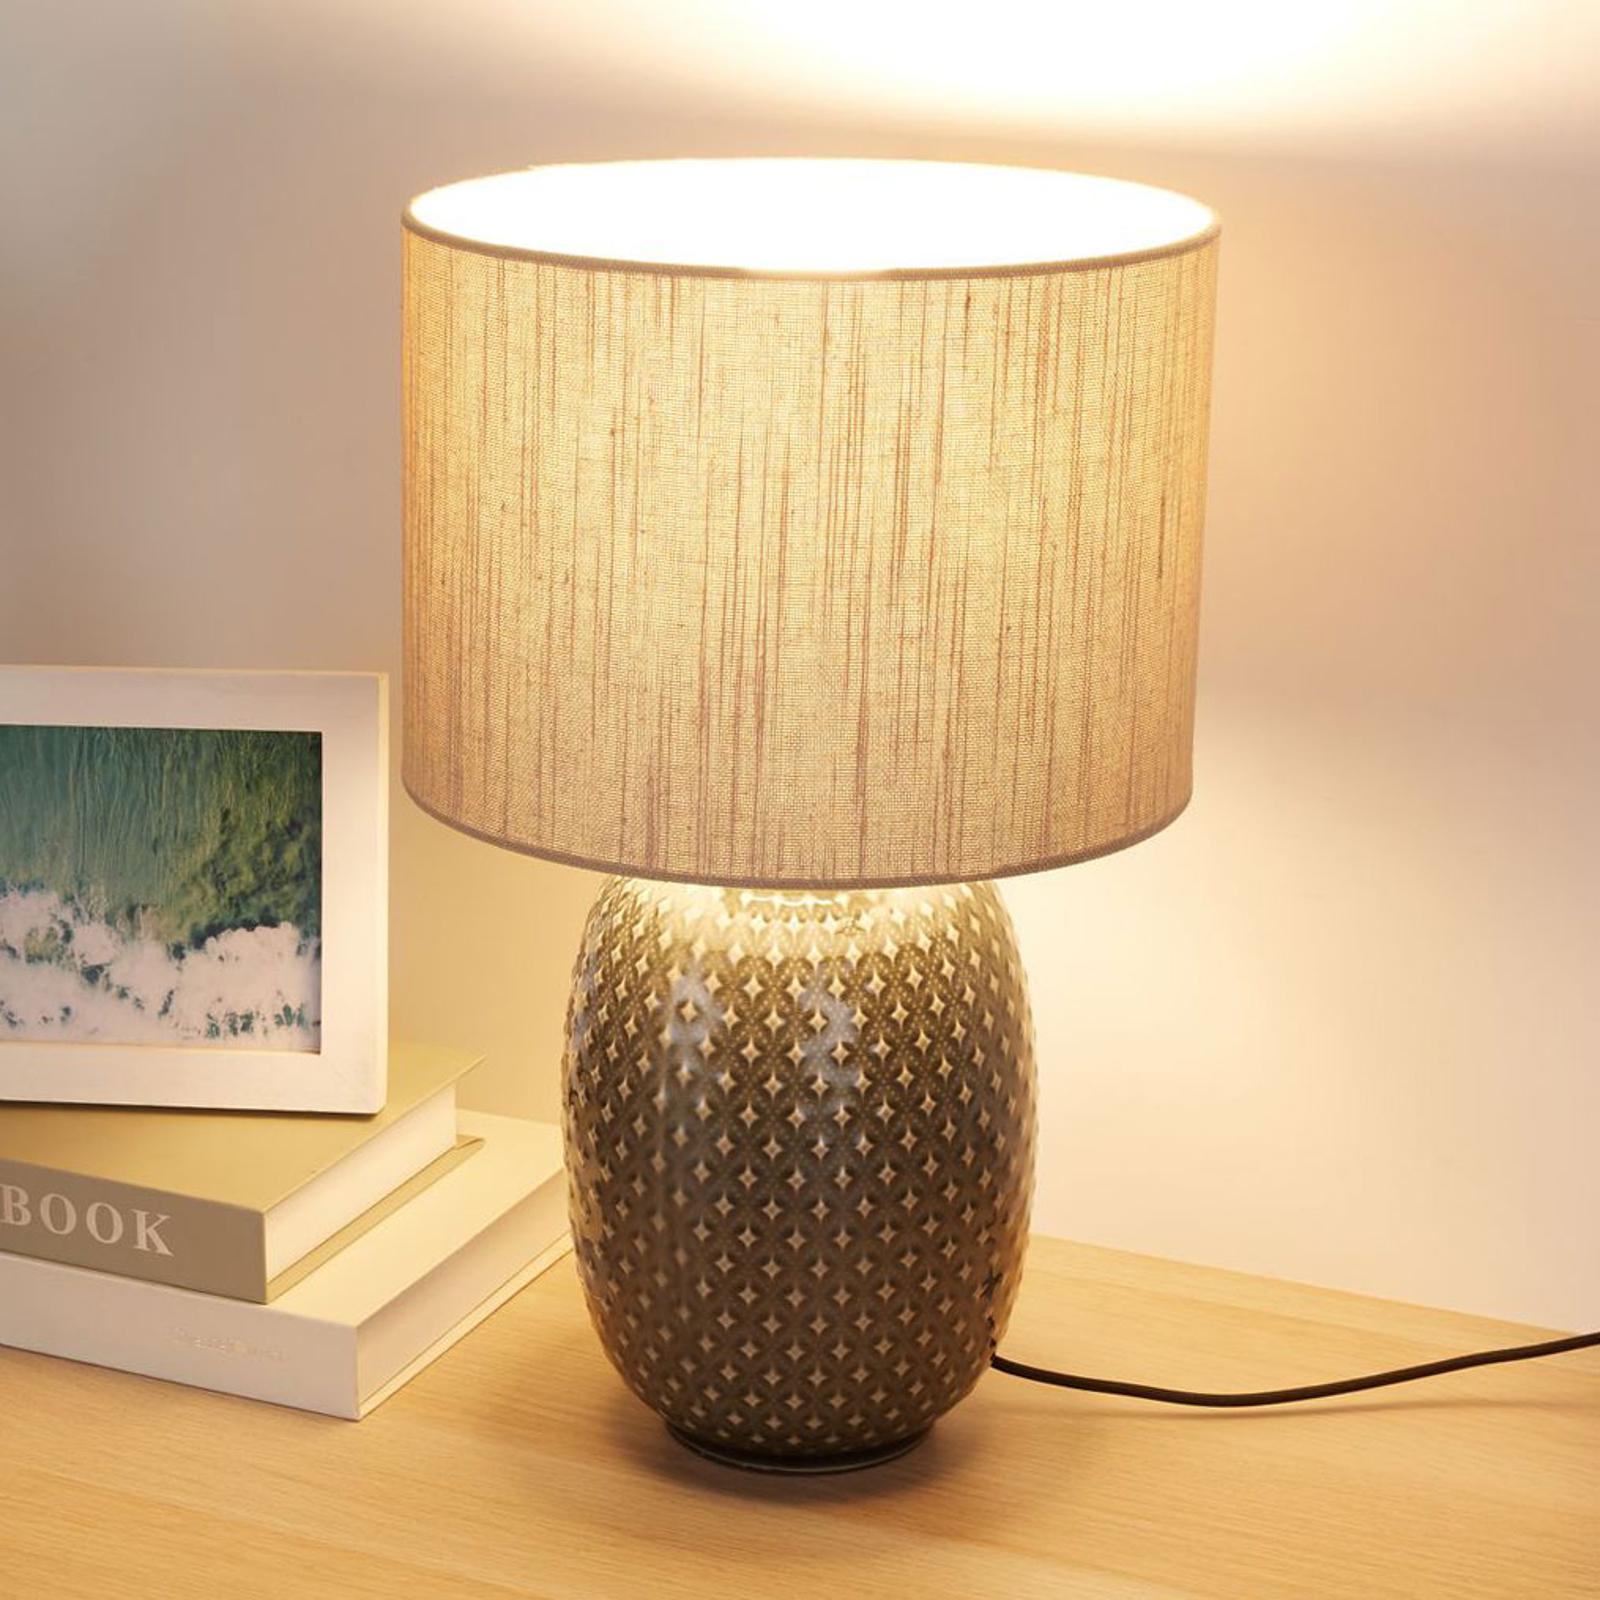 Pauleen Pretty Classy Tischlampe mit Keramikfuß